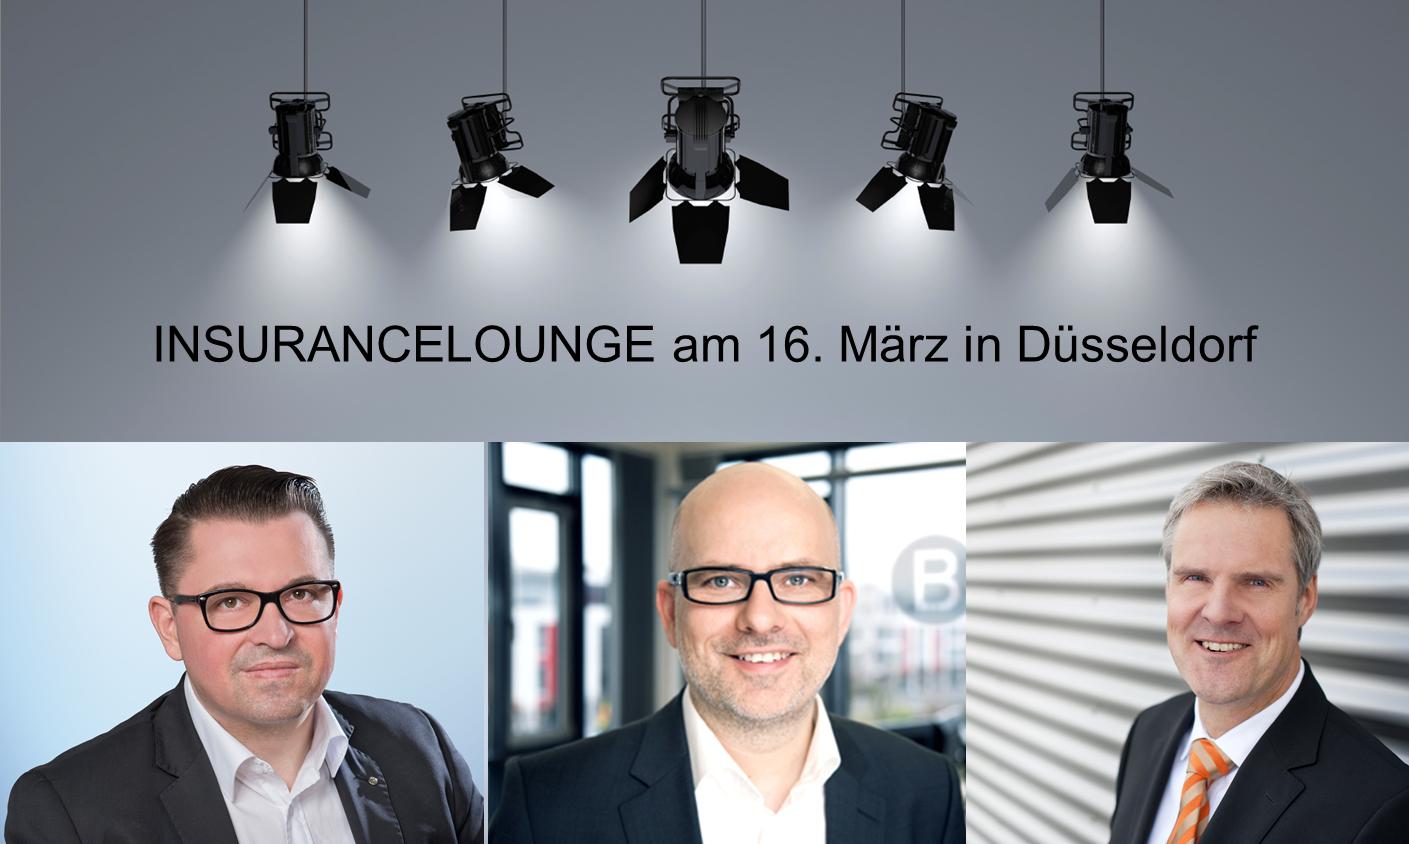 FI-TS InsuranceLounge Düsseldorf